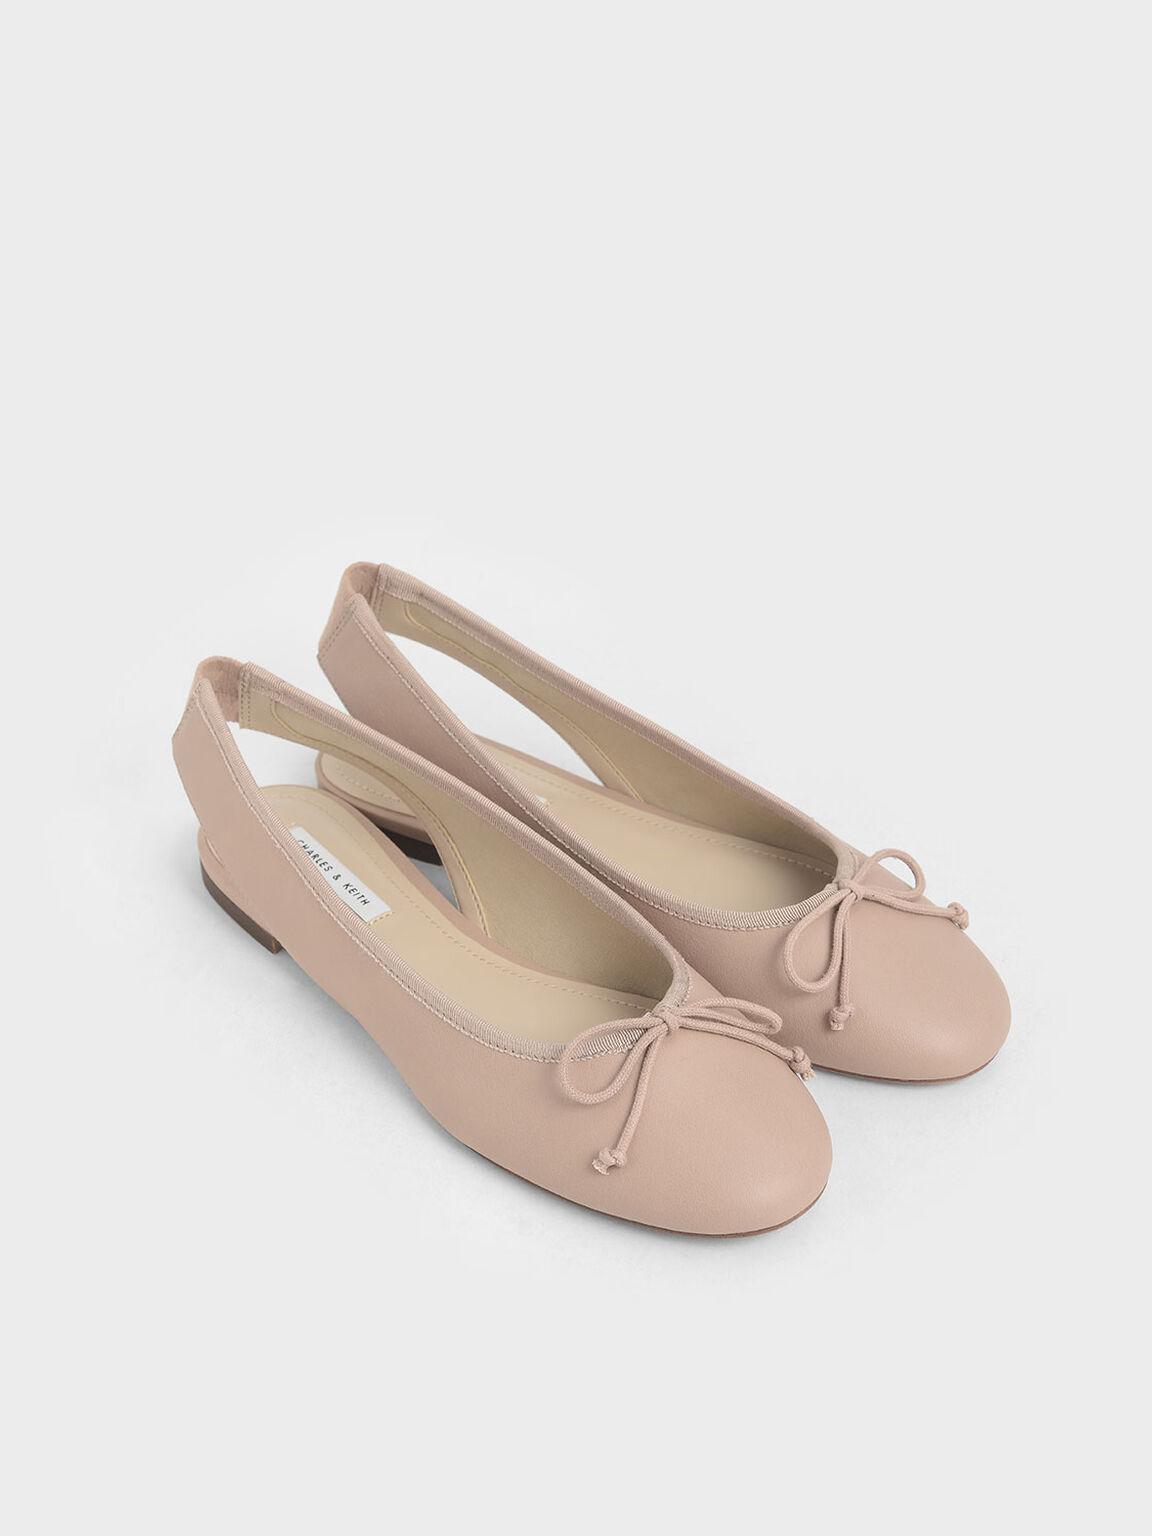 蝴蝶結平底鞋, 膚色, hi-res